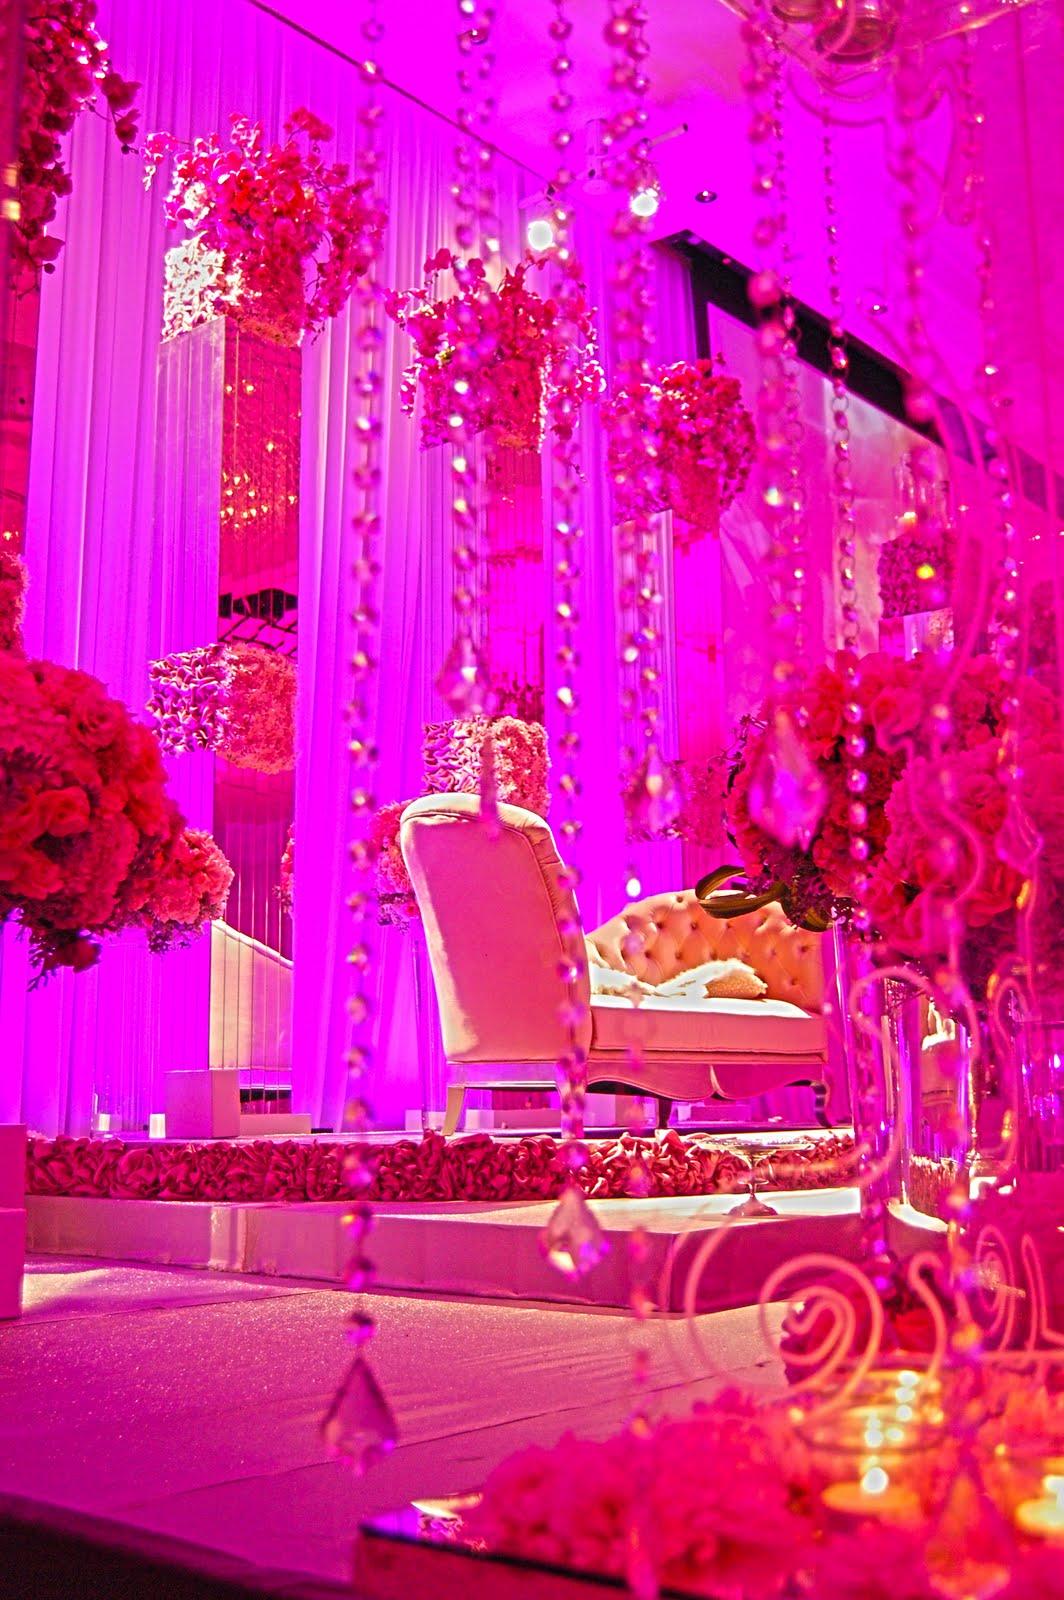 1000 images about Fuschia wedding ideas on Pinterest